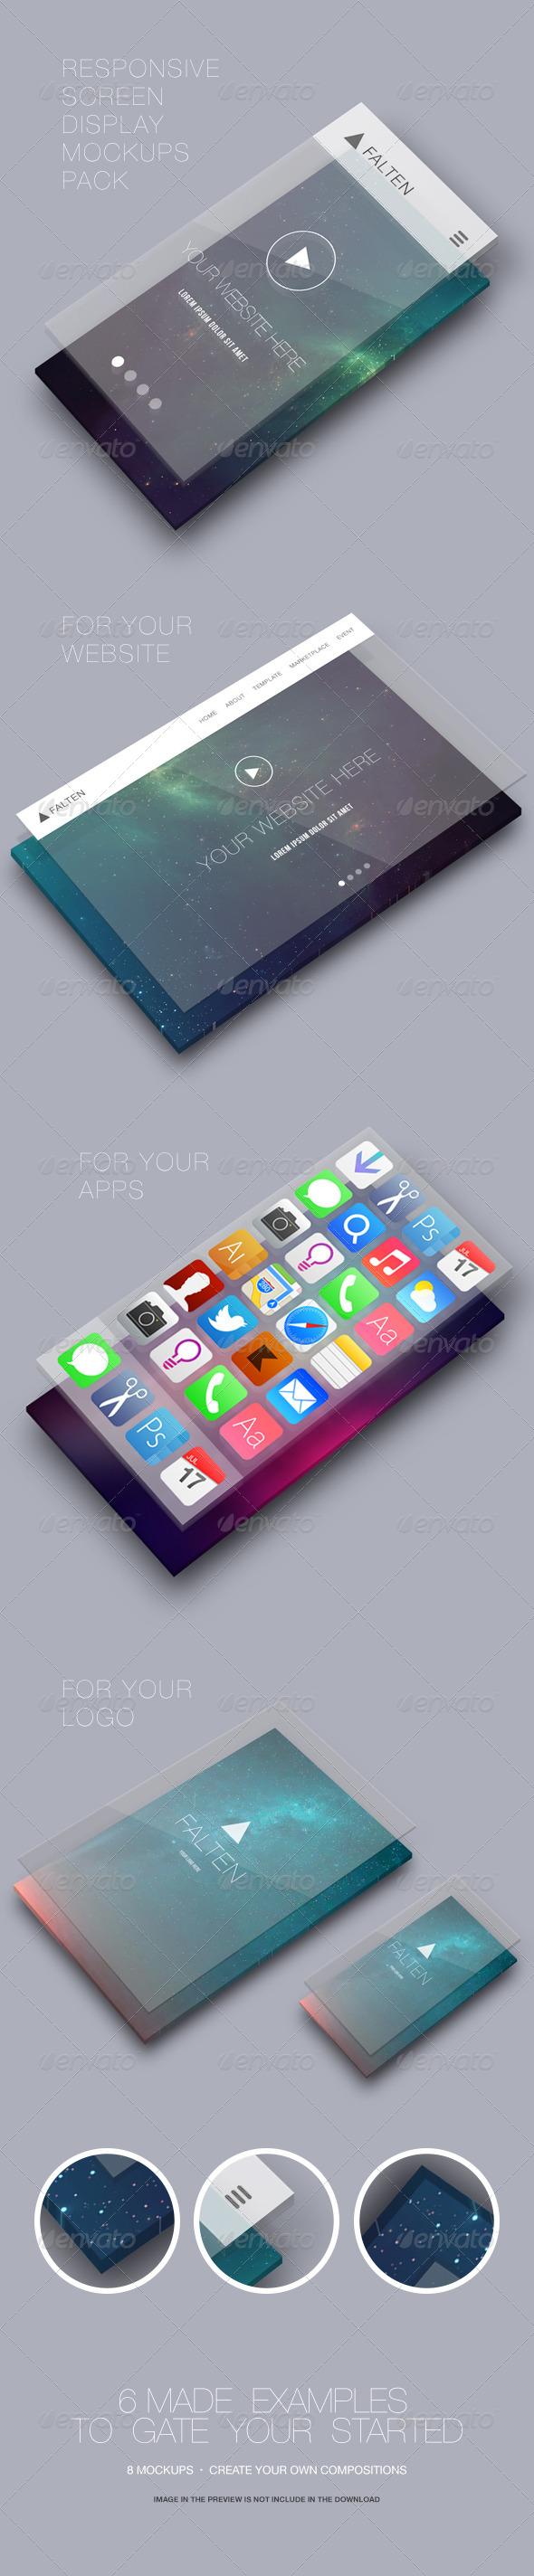 Responsive Screen Display Mockups Pack - Miscellaneous Displays